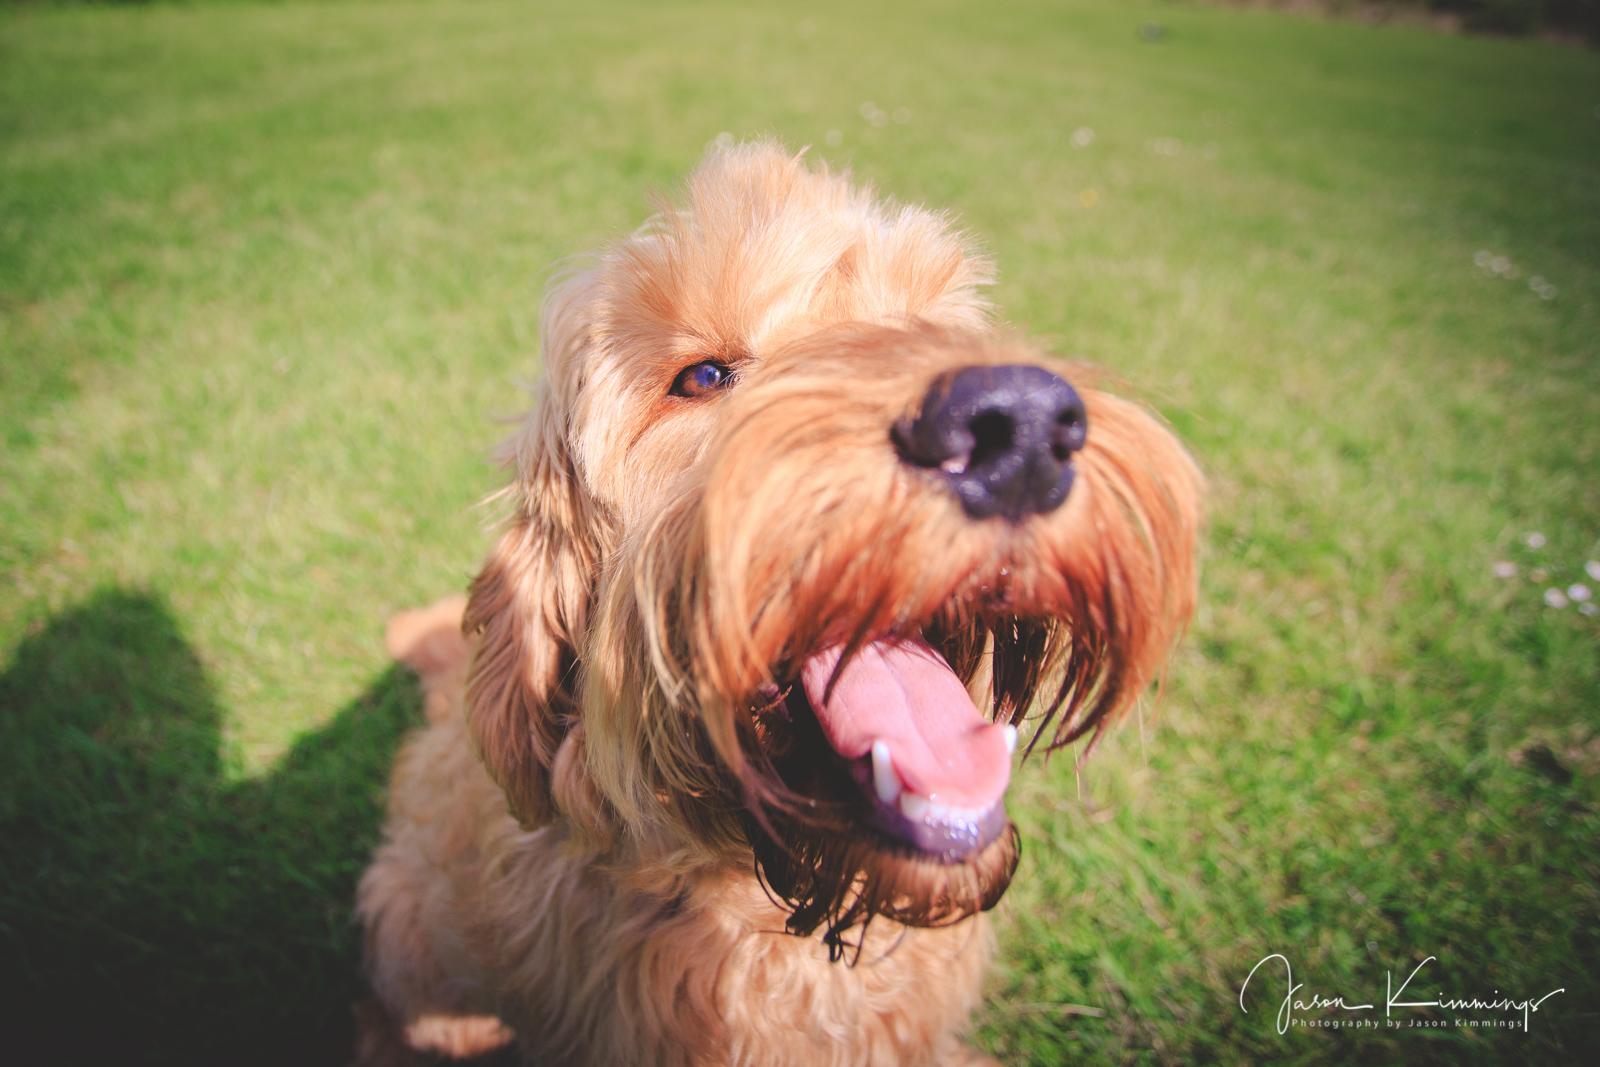 Dog-pet-photography-edinburgh-glasgow-west-lothian-5.jpg